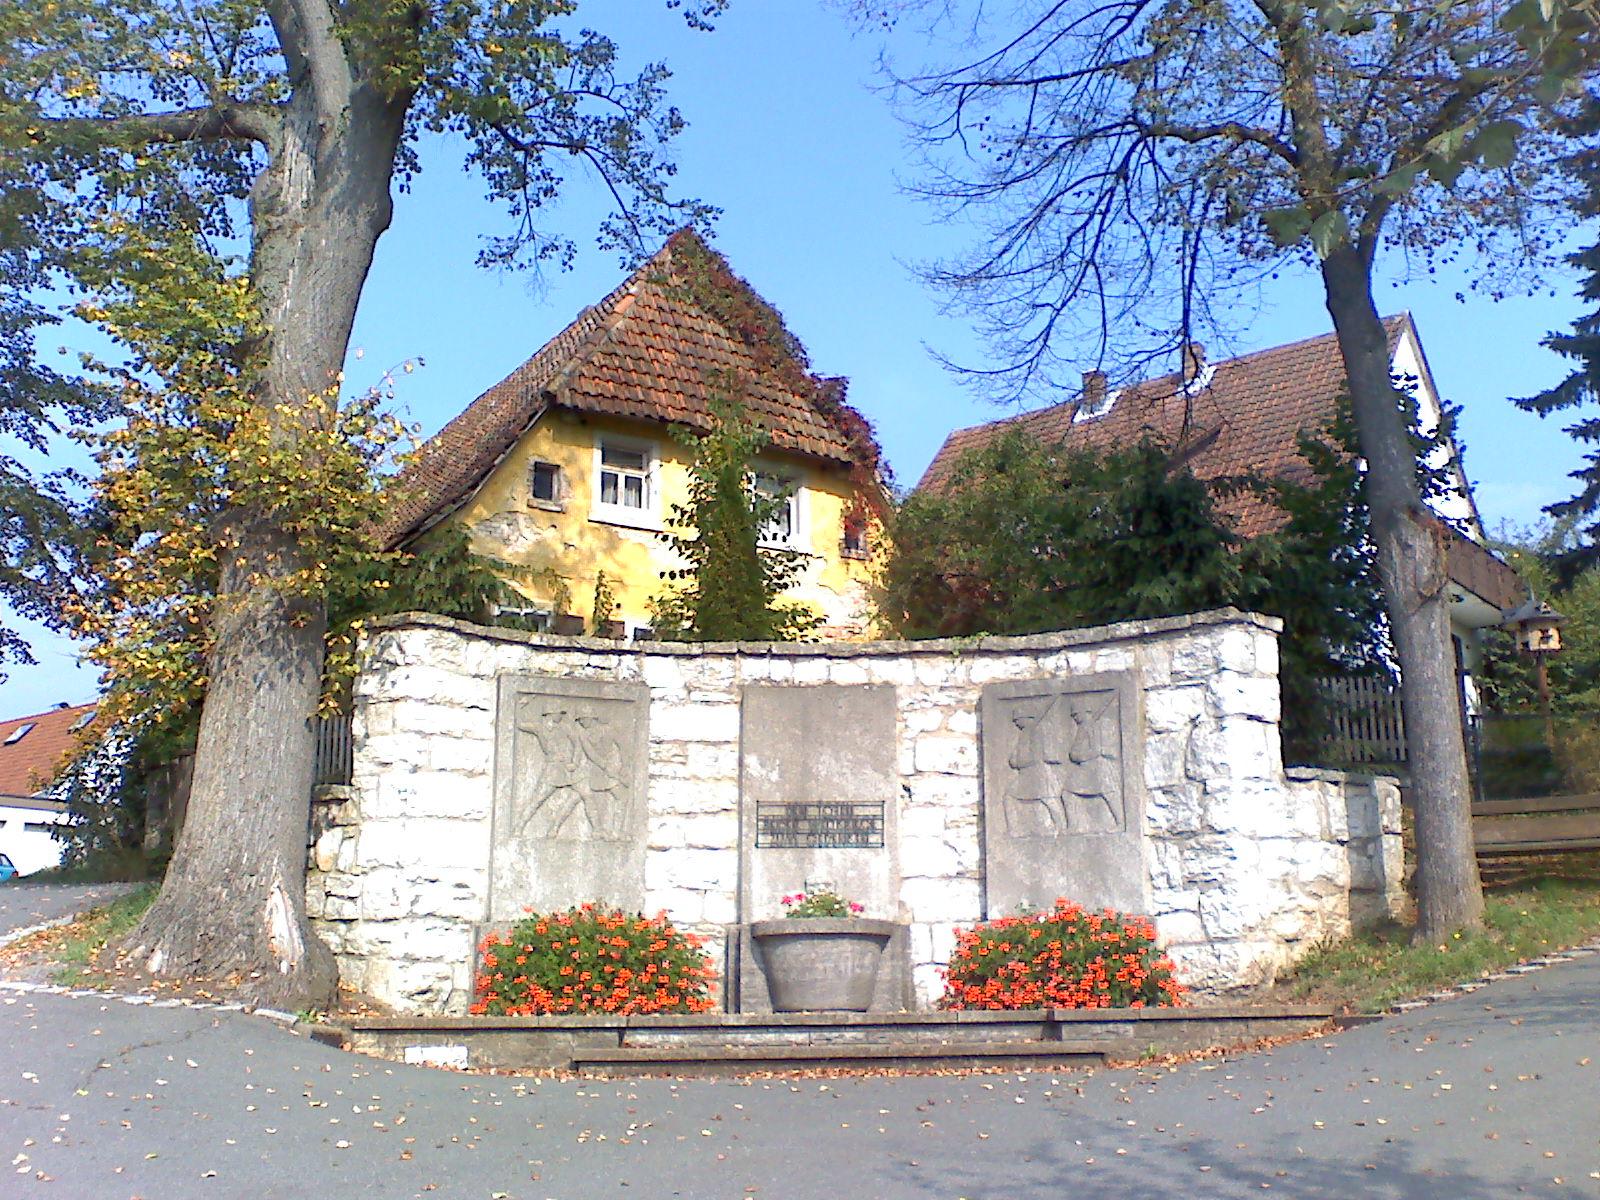 Geisterhaus Bayern